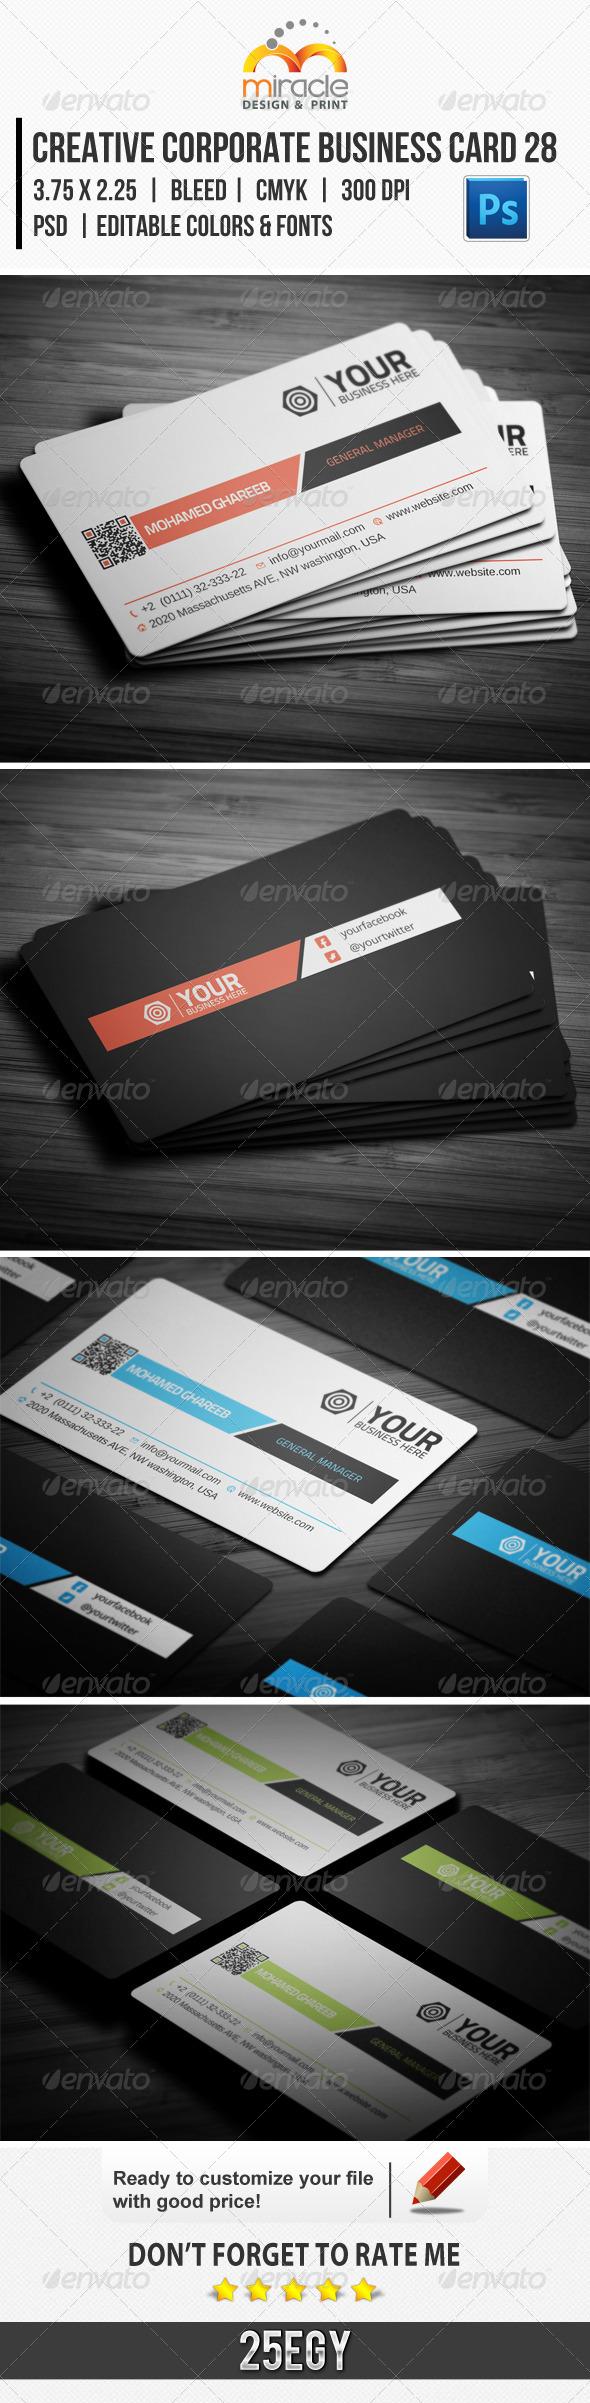 Creative Corporate Business Card 28 - Creative Business Cards